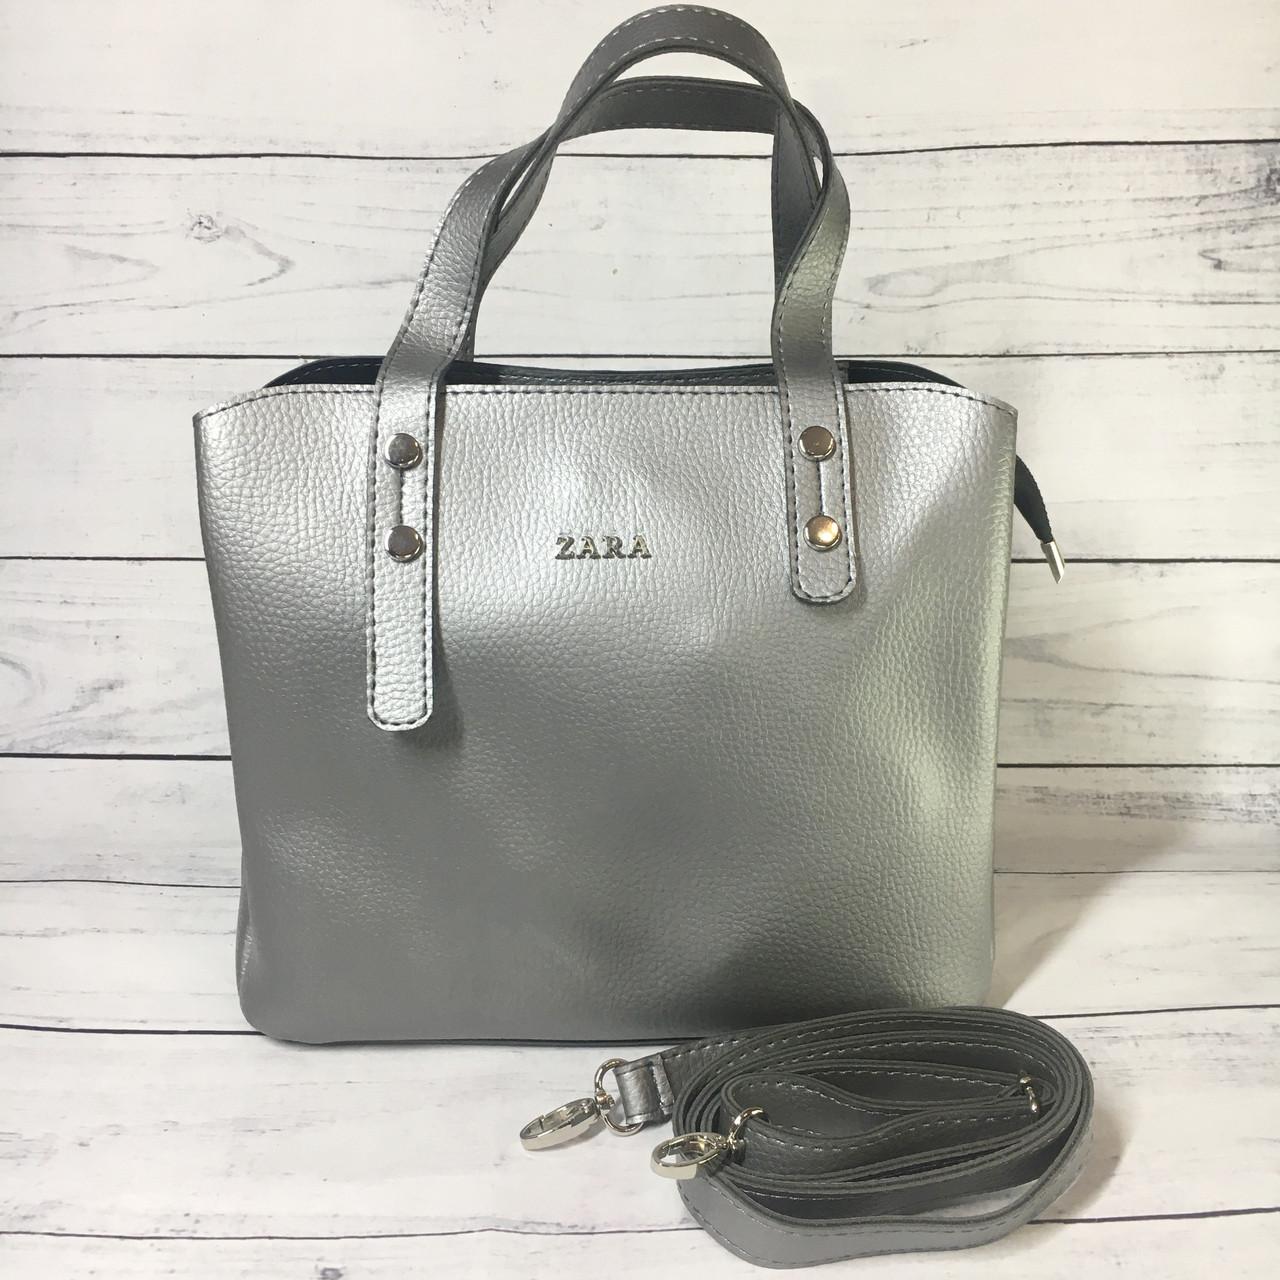 Женская сумка Zara (Зара), серебристая ( код: IBG216S2 )